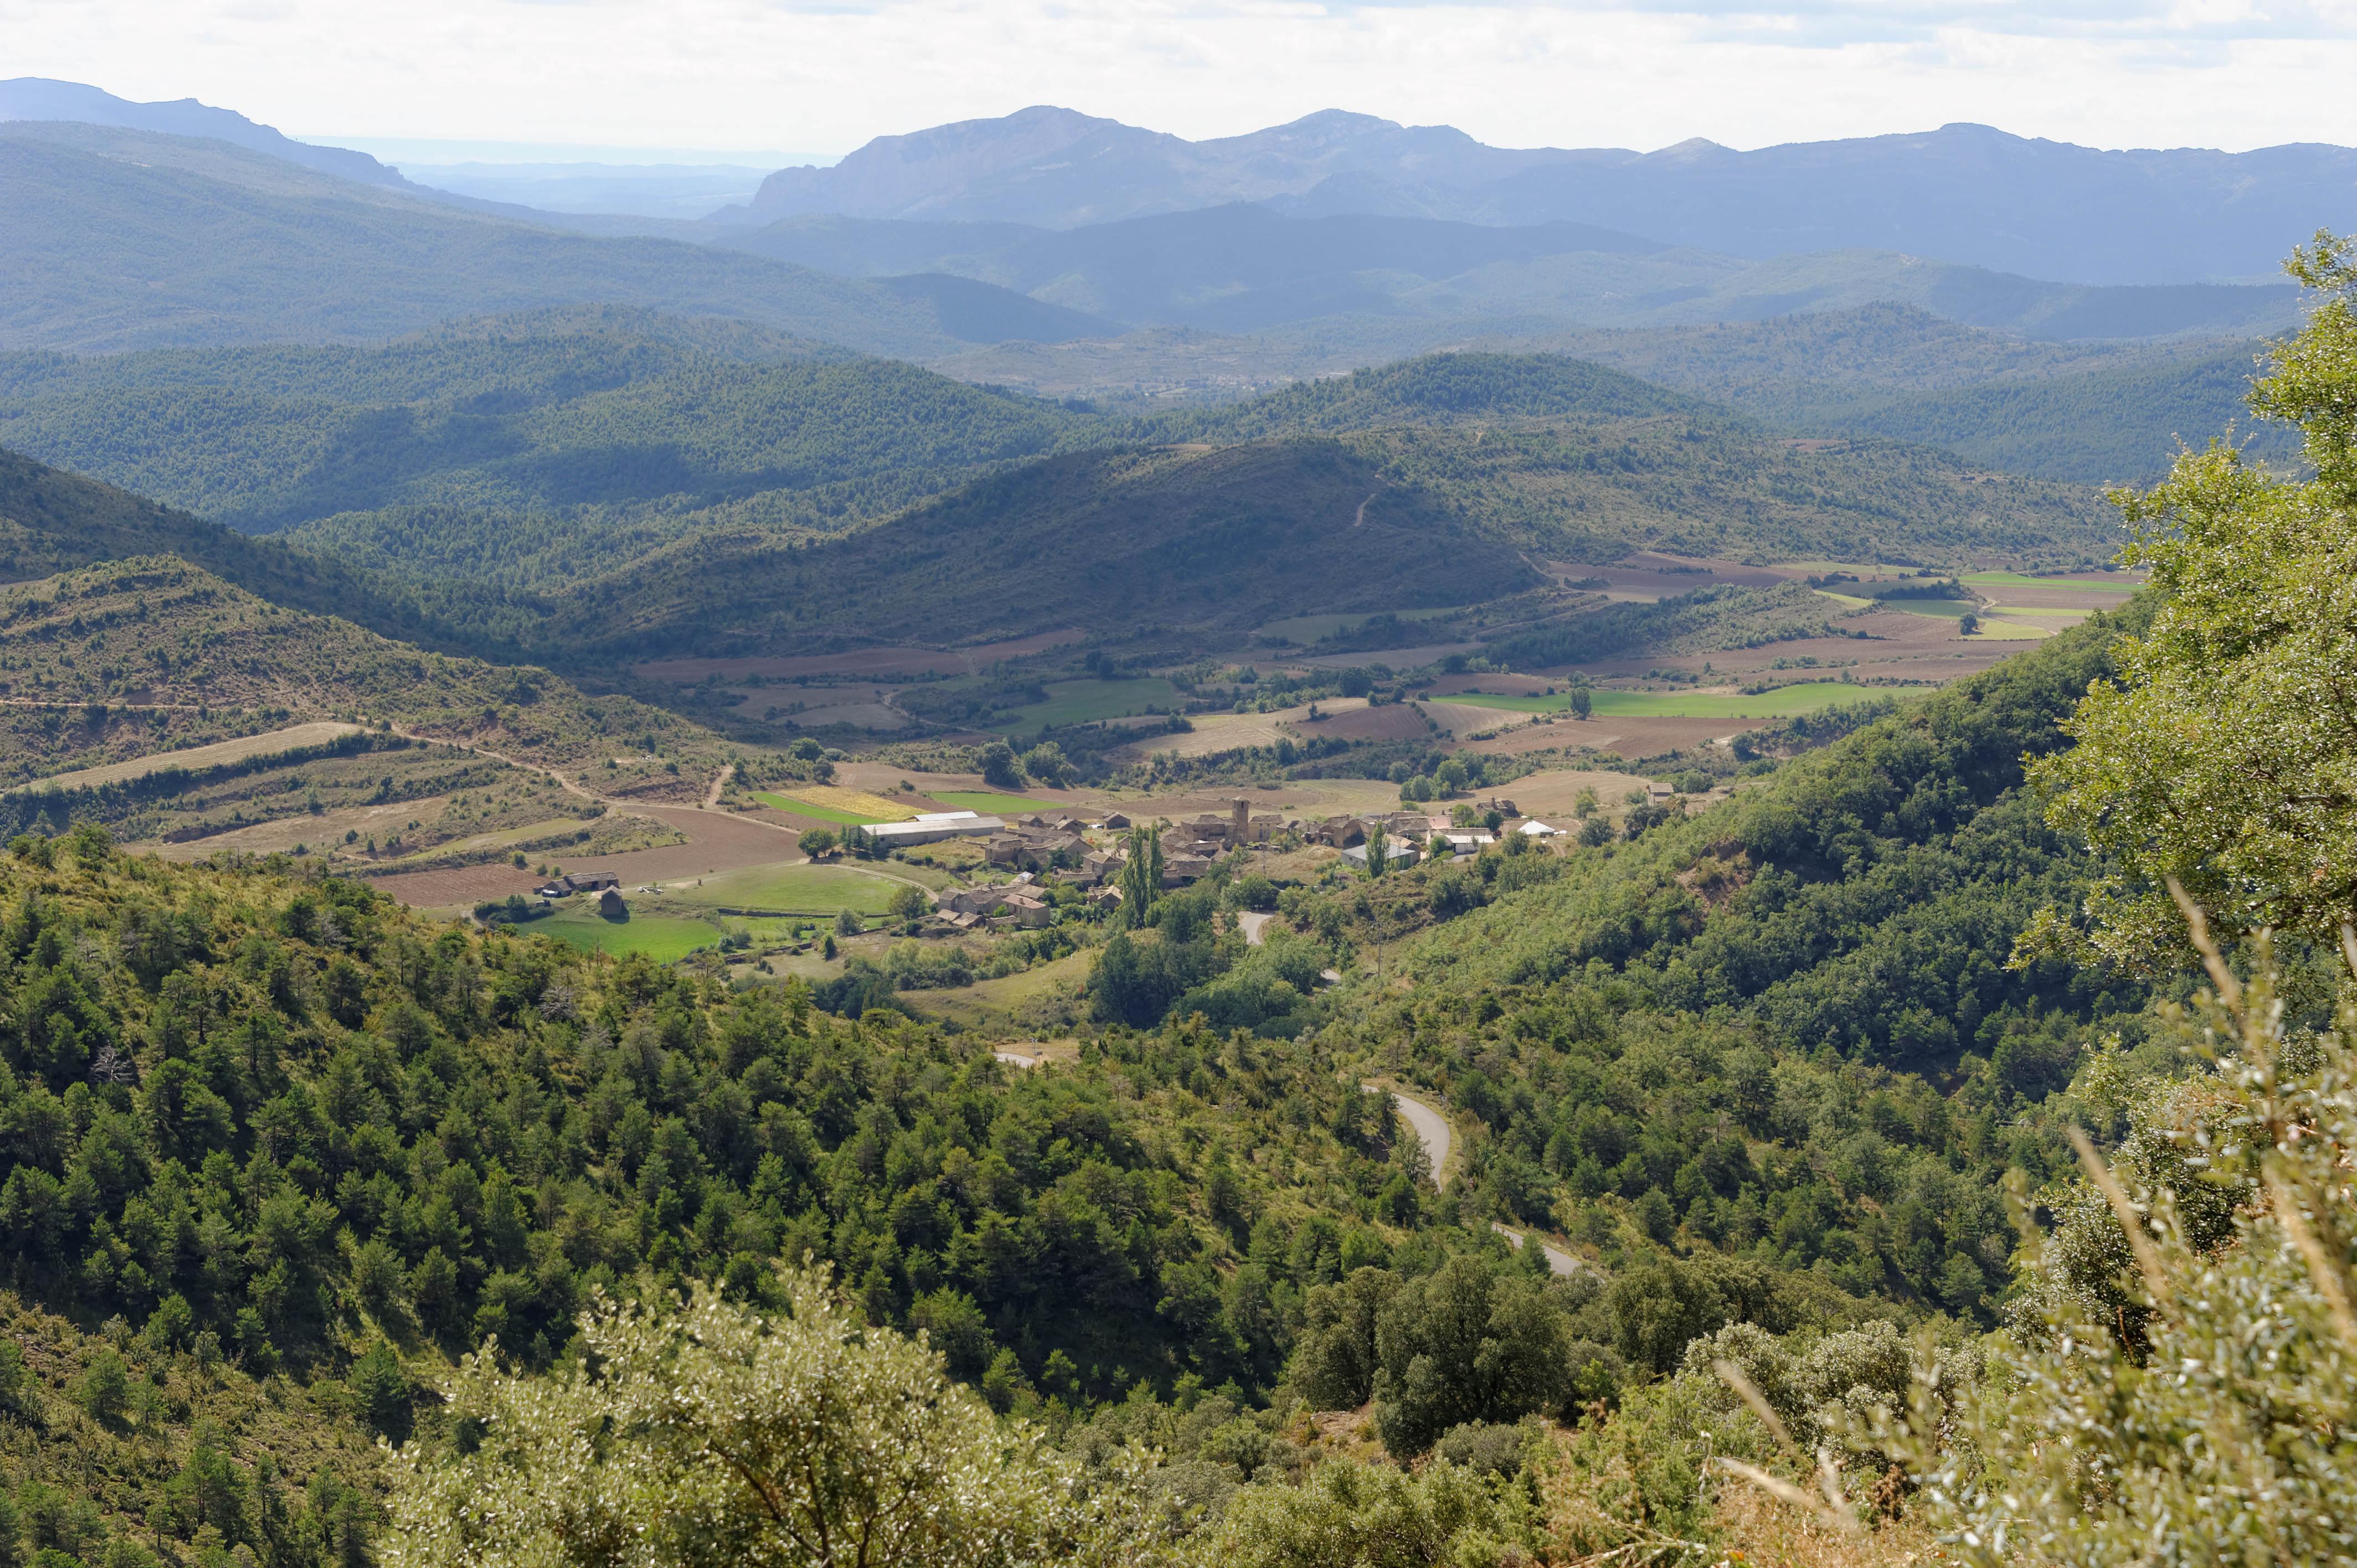 3762_vers San Juan de la Pena (Aragon)